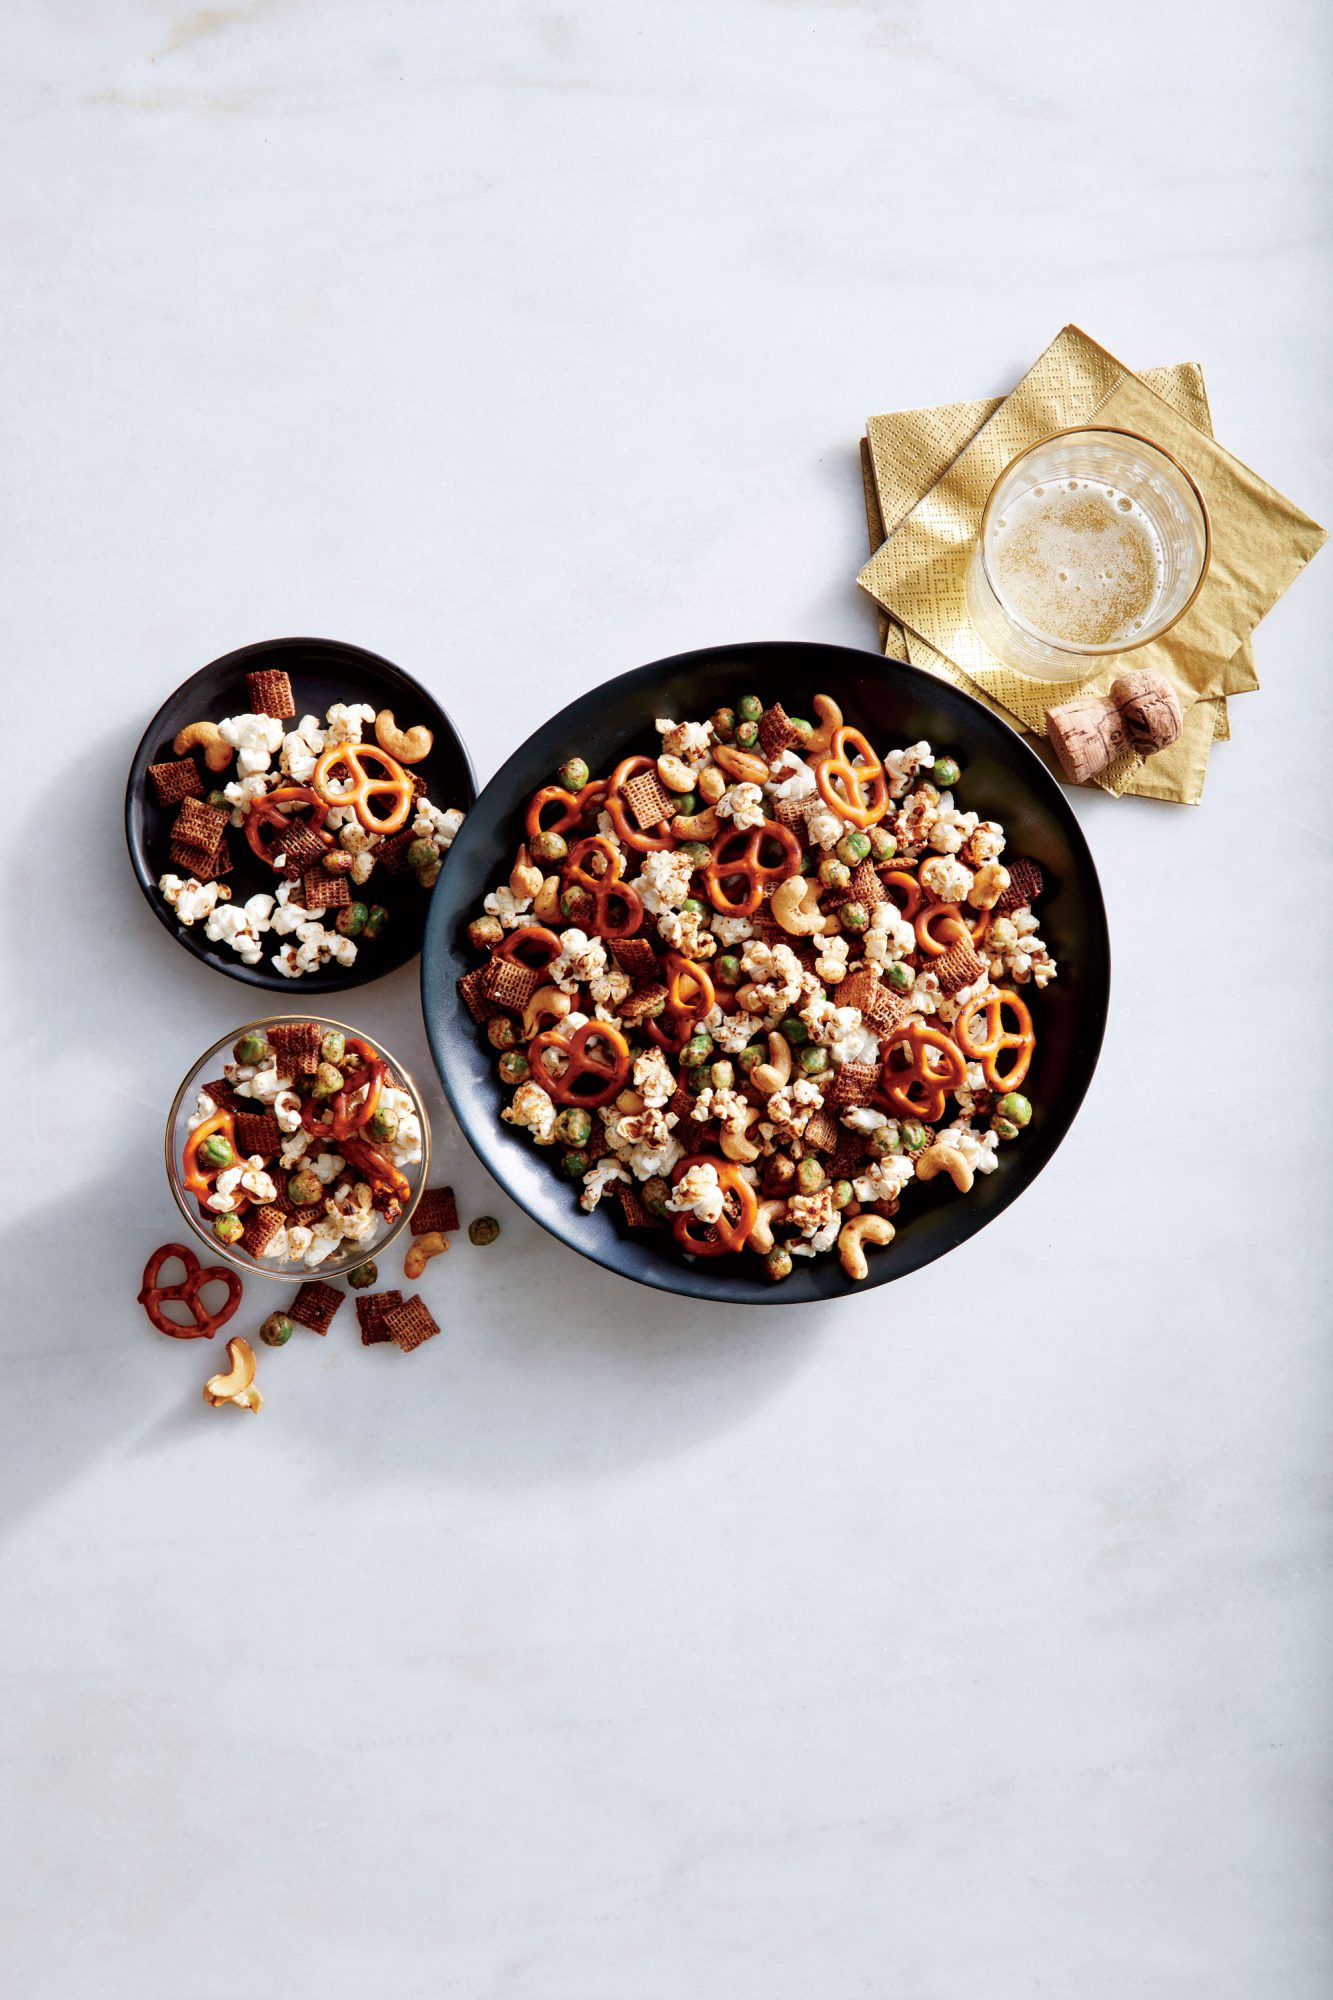 Sesame-Soy Nut and Pretzel Mix image